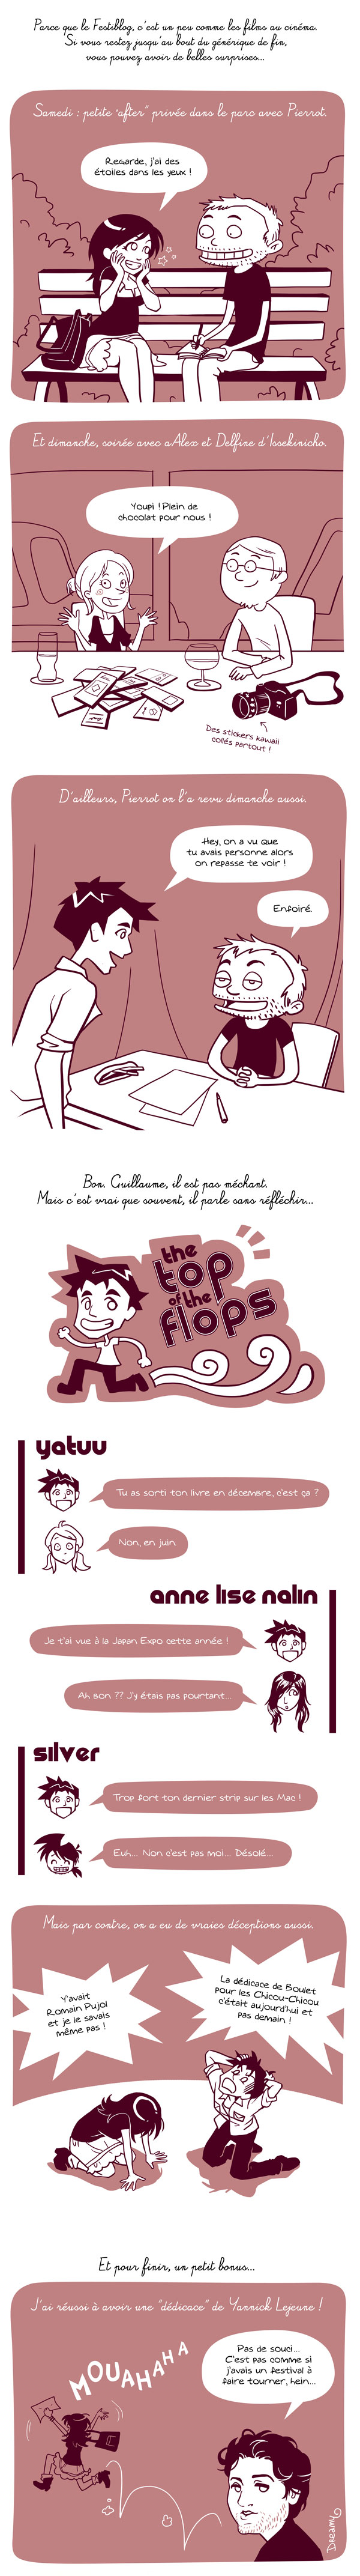 Festiblog 2011 (3/3)